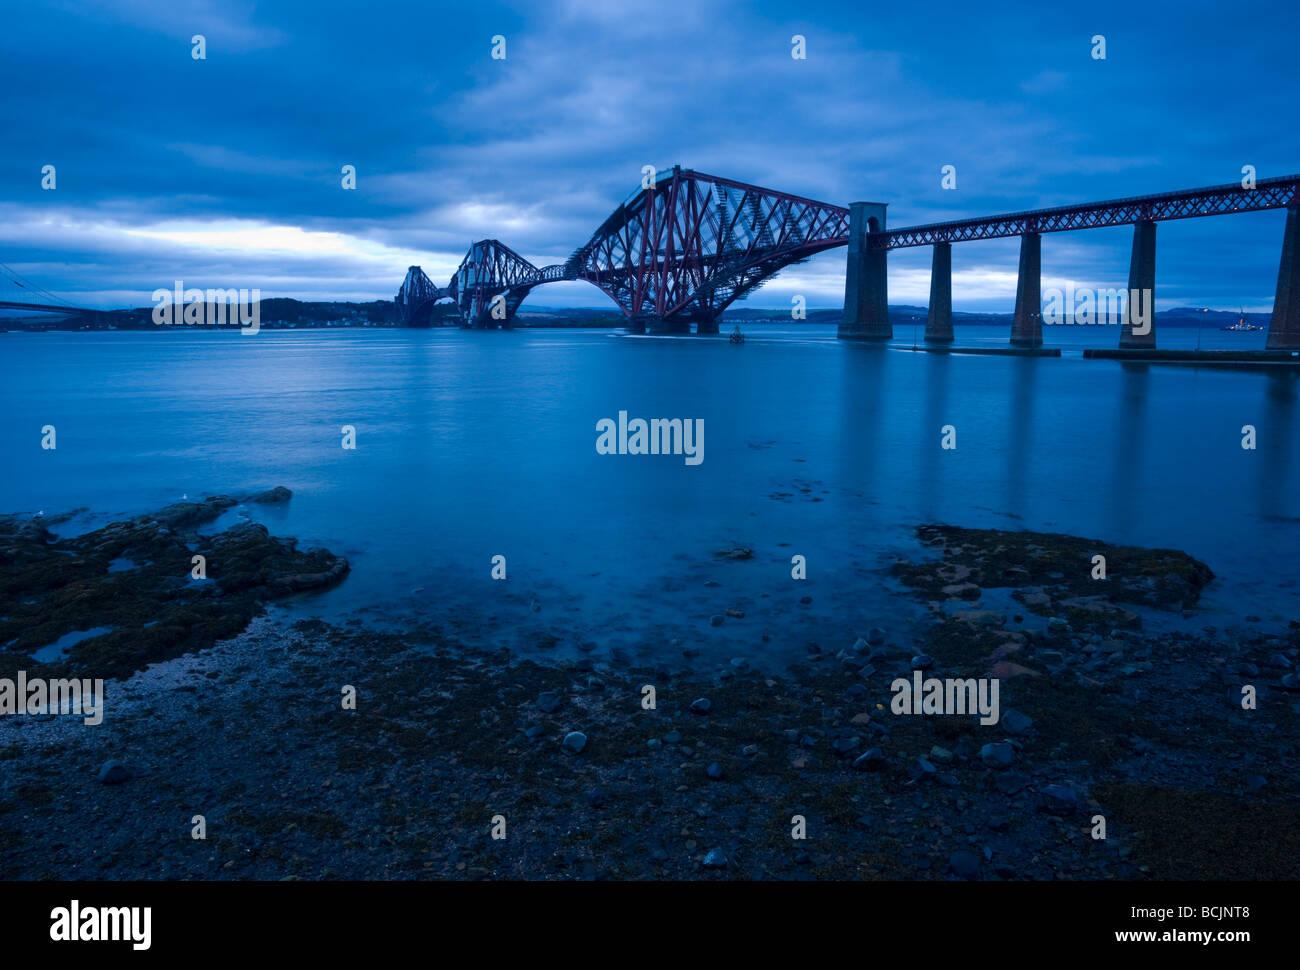 UK, Scotland, Edinburgh, Firth of Forth, The Forth Rail Bridge - Stock Image